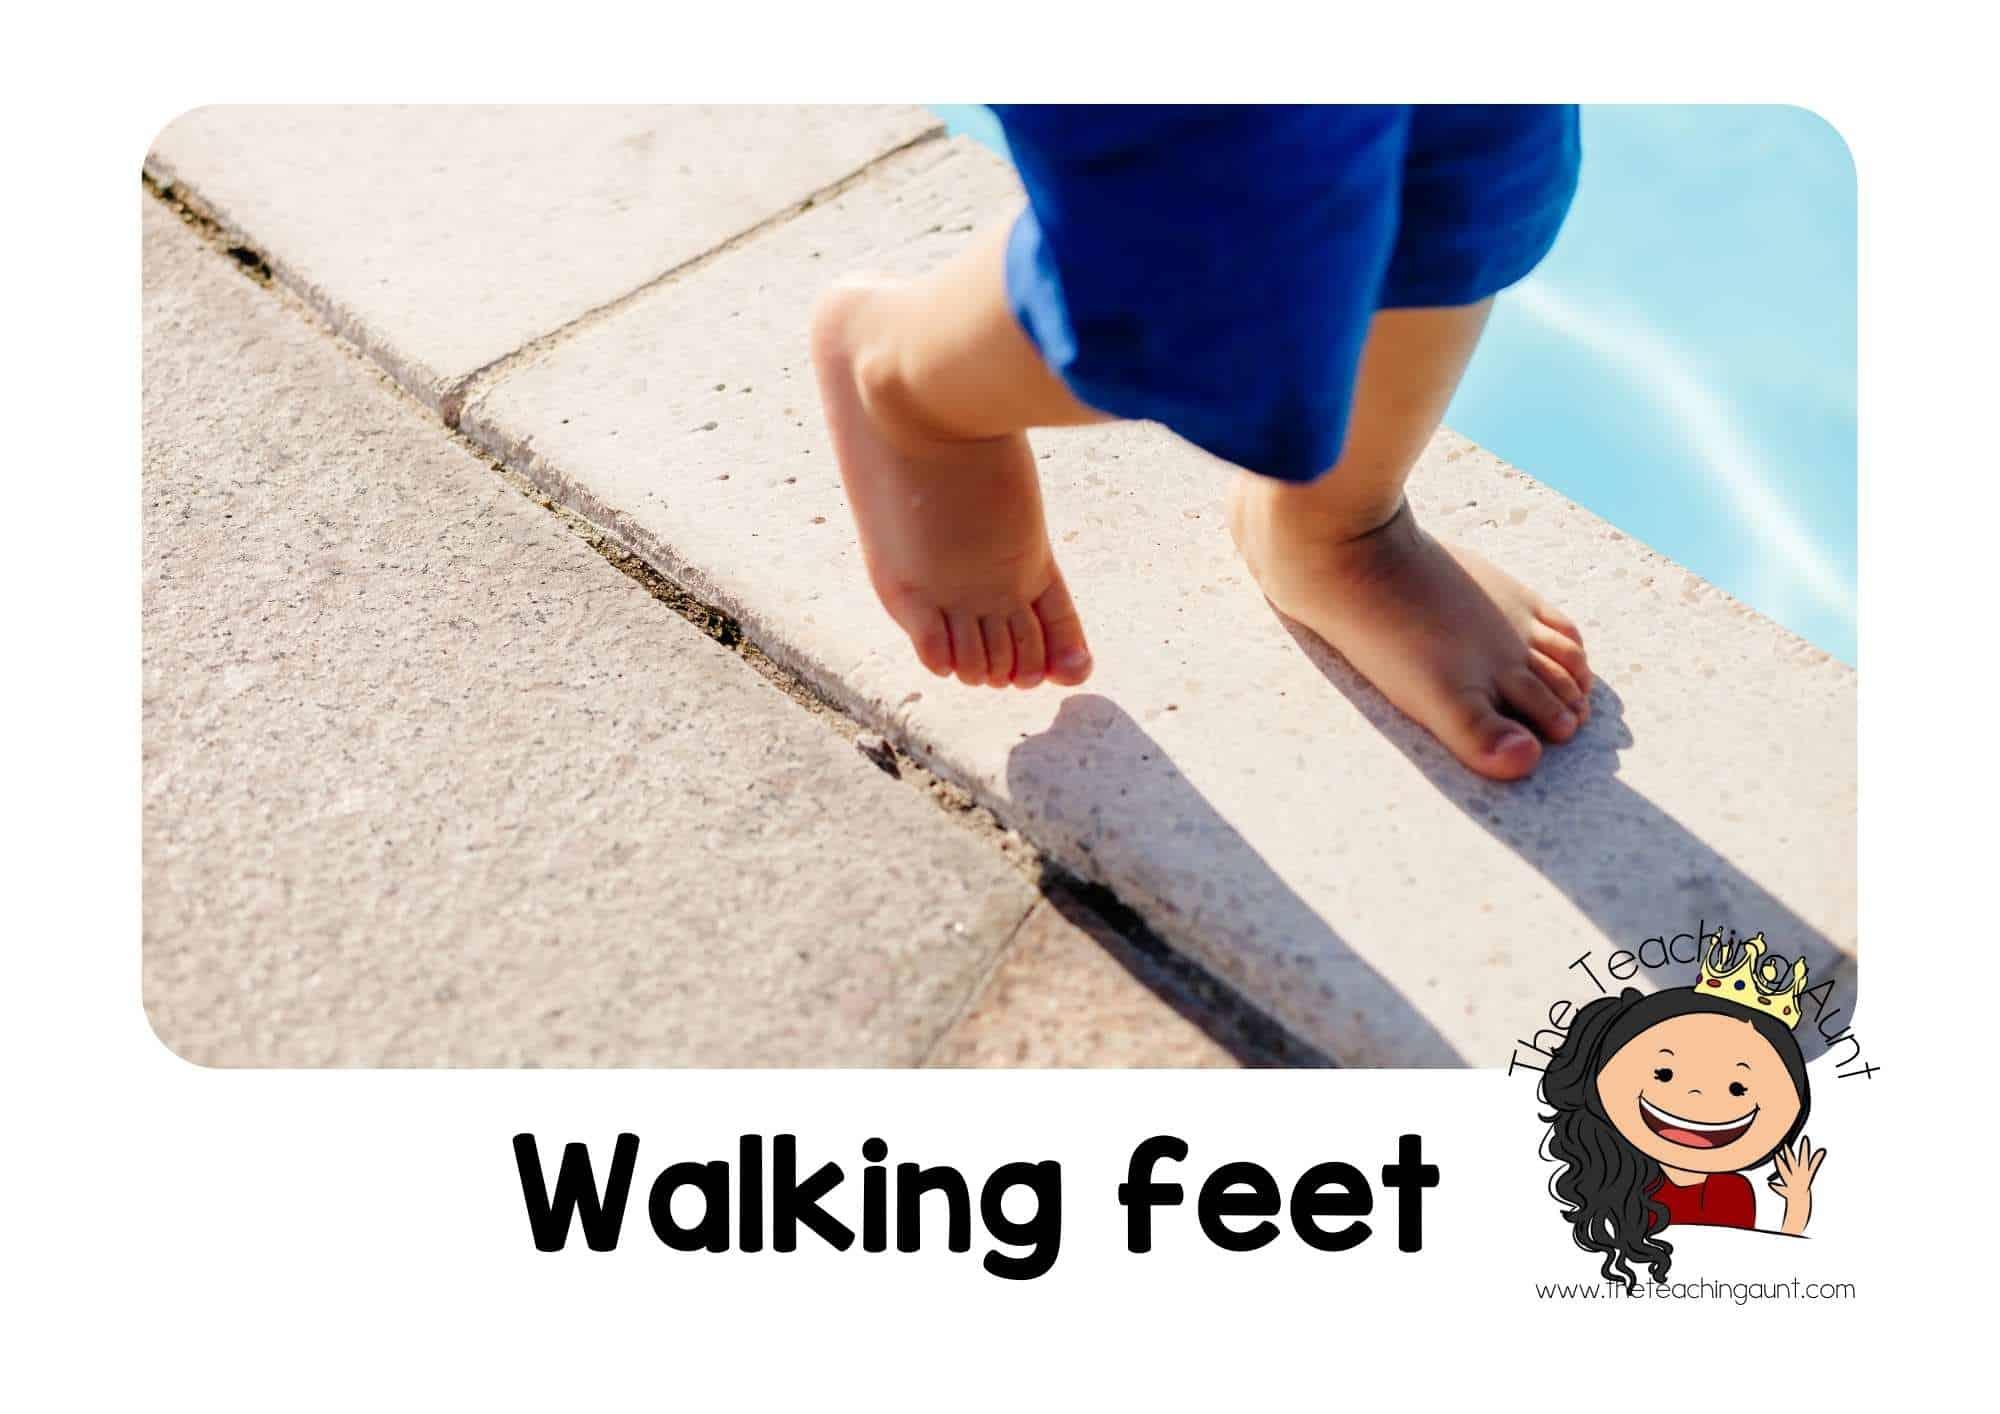 Free Classroom Rules Posters for Preschool- Walking feet